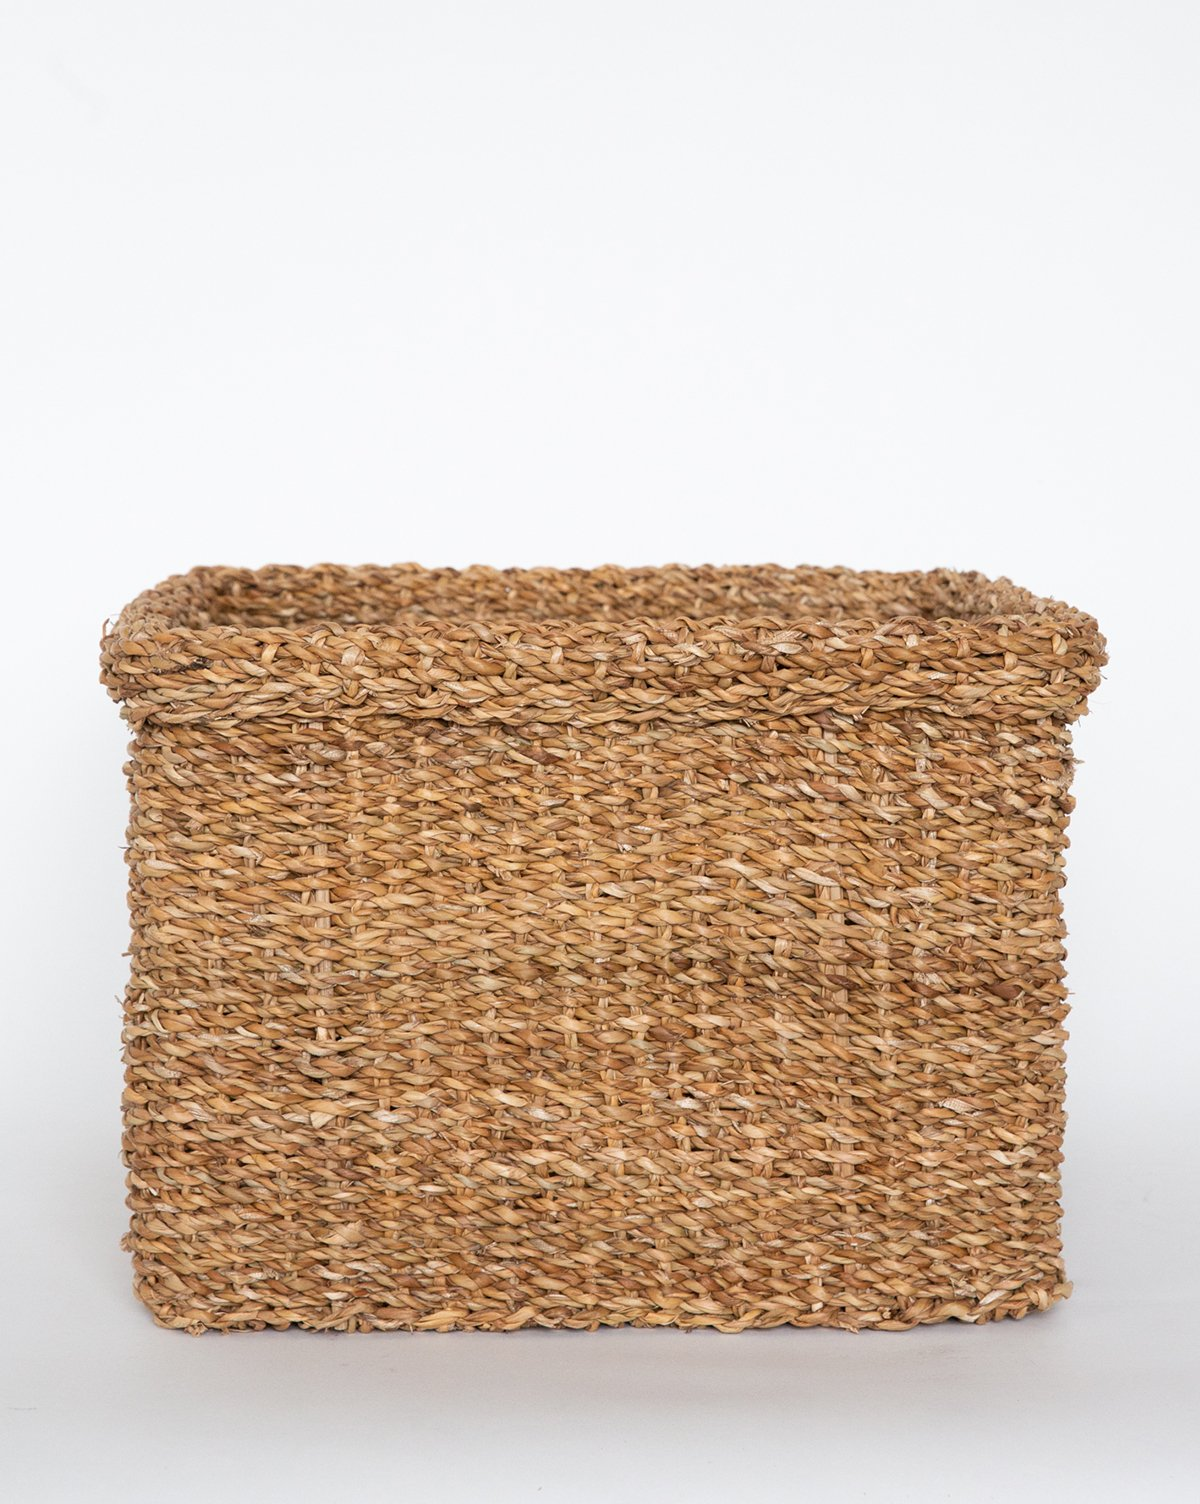 square_cuffed_seagrass_baskets1.jpg